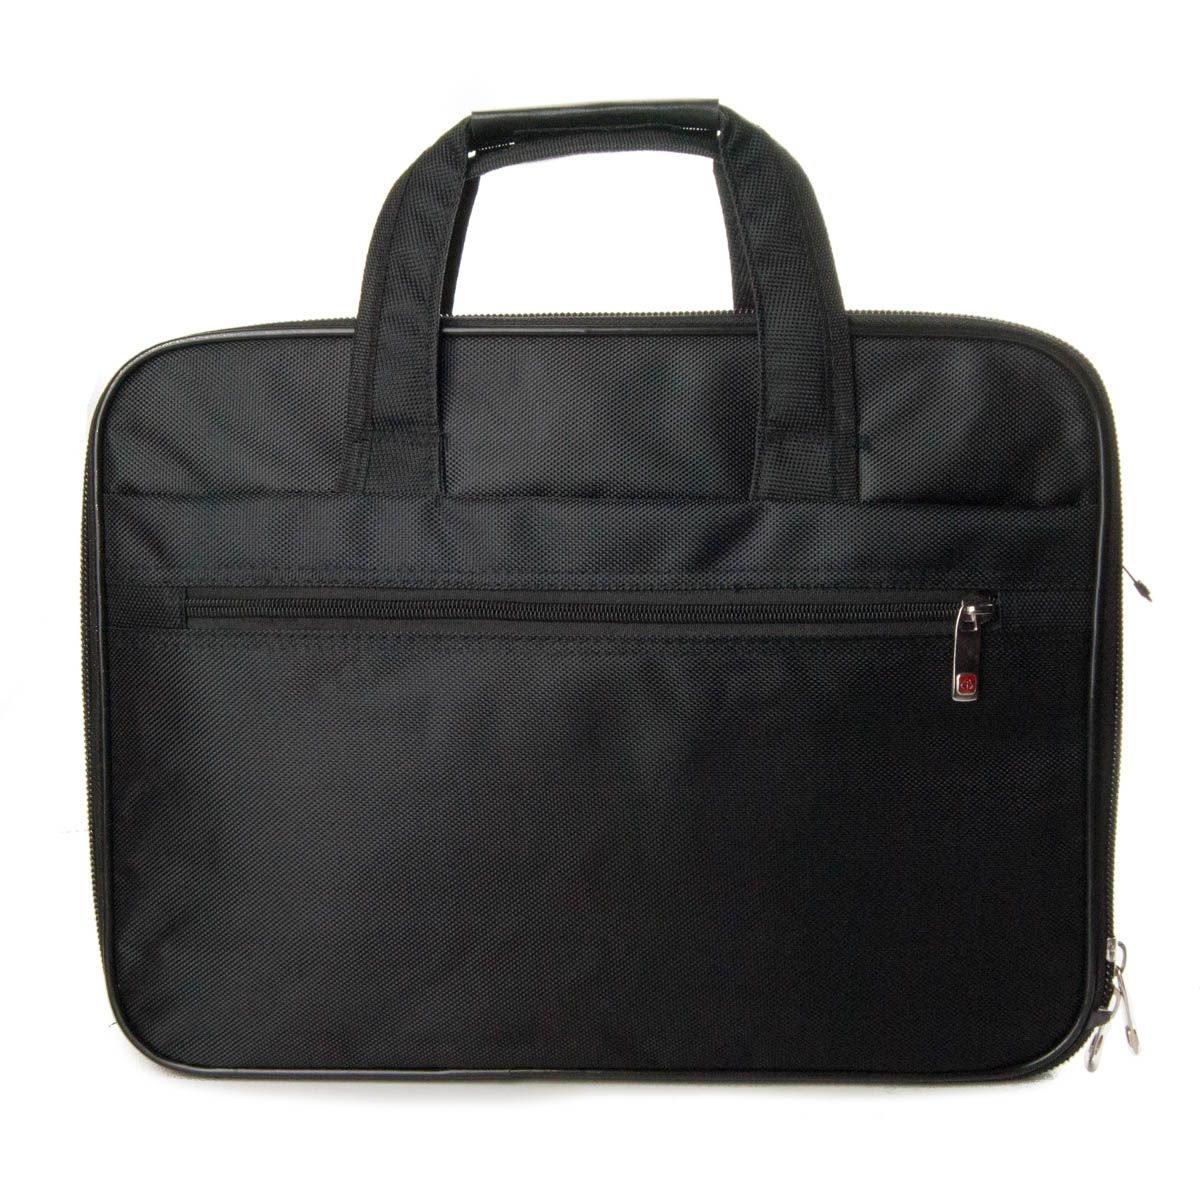 Montevita Computer Bag in Black